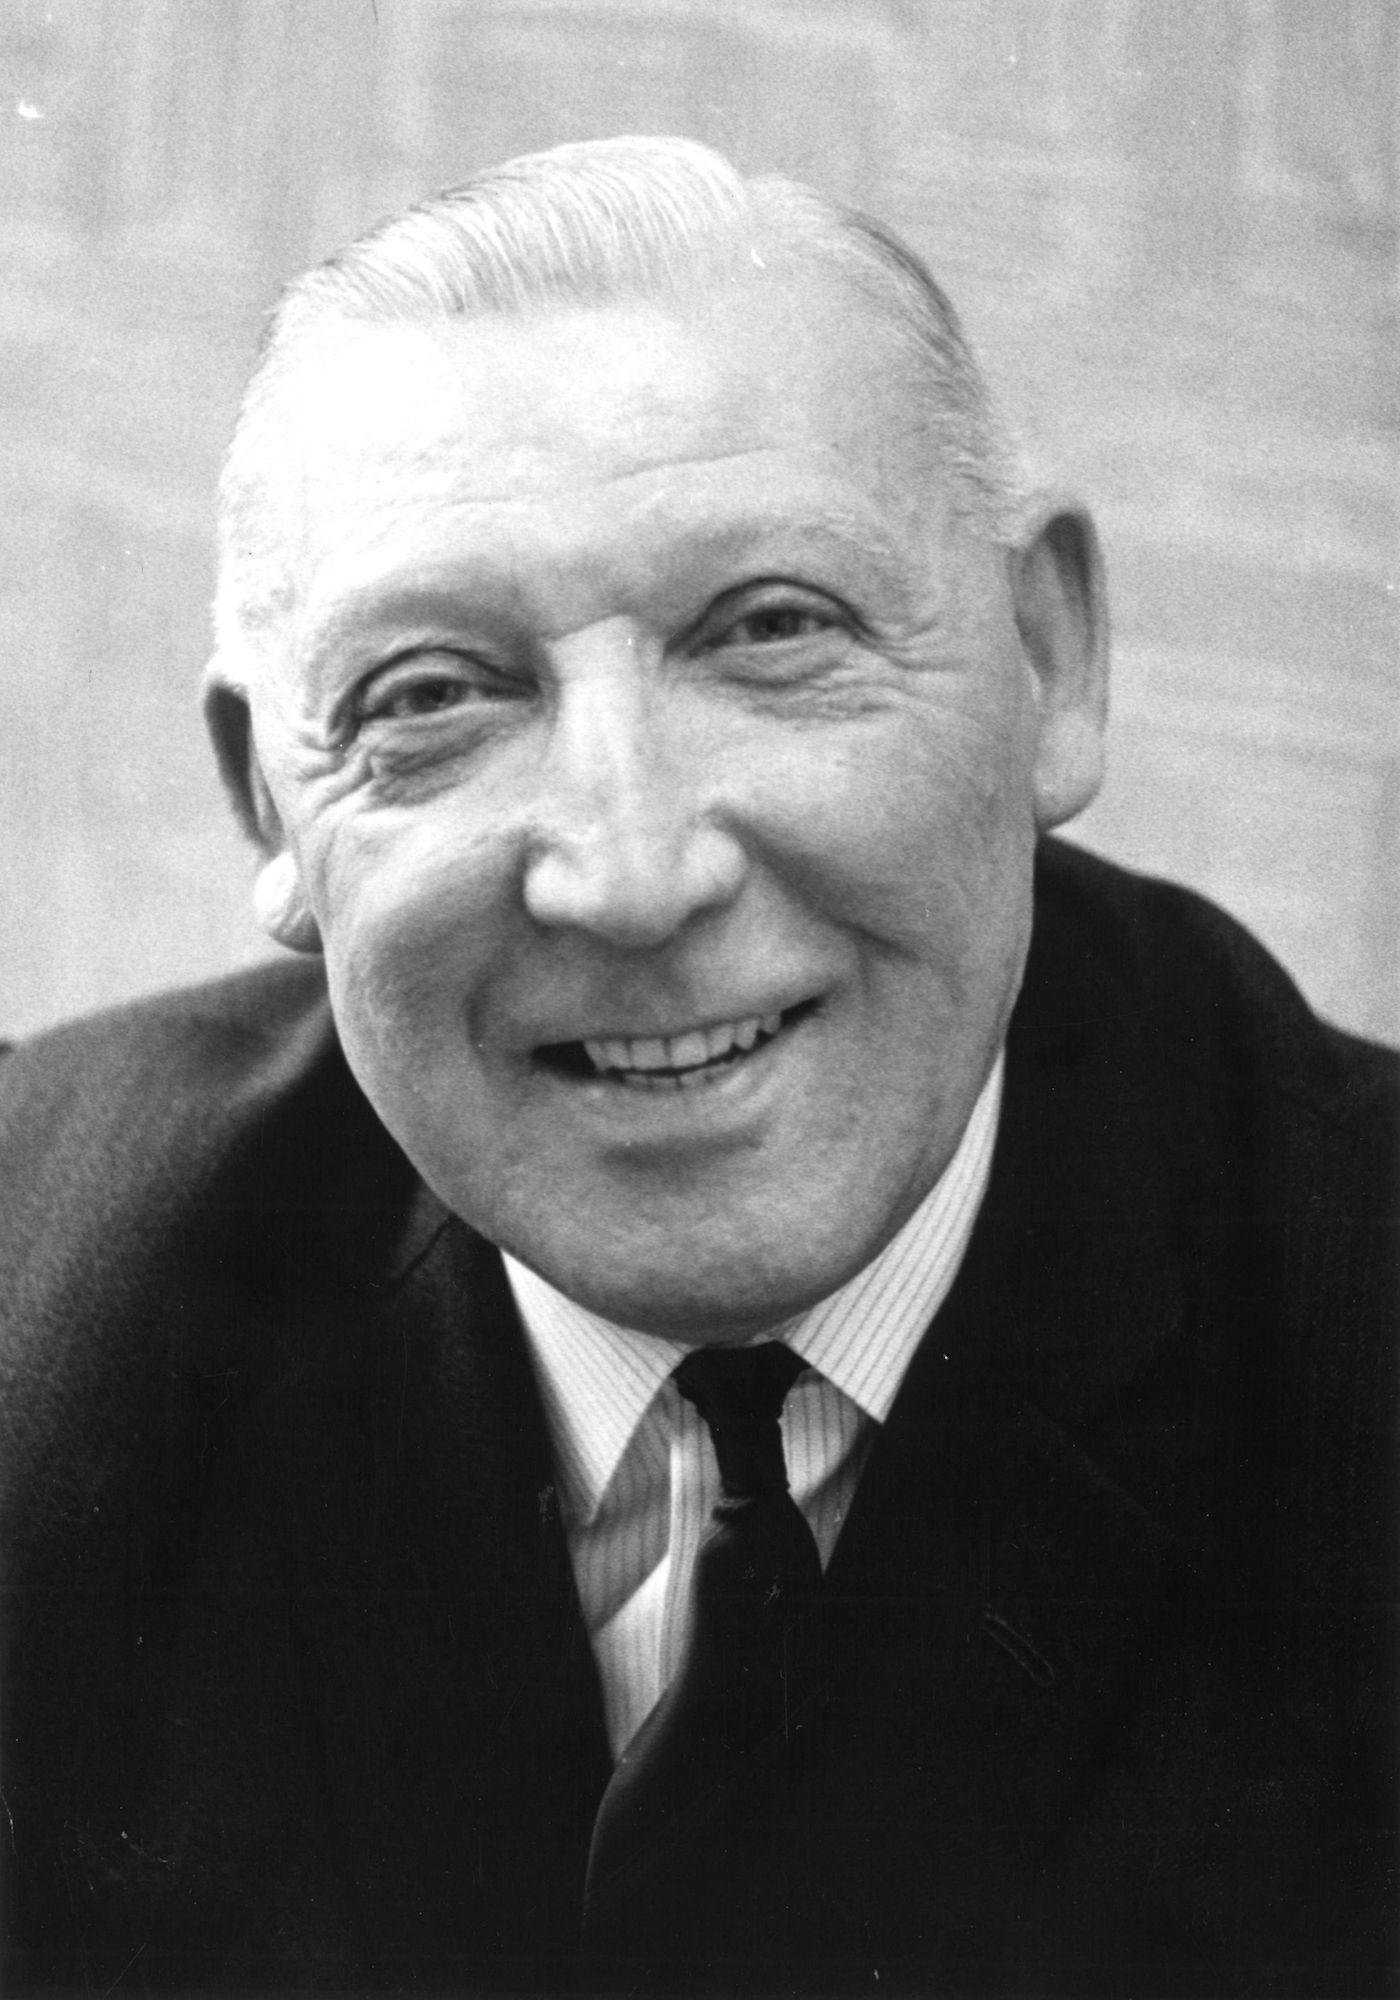 Paul Huyzentruyt